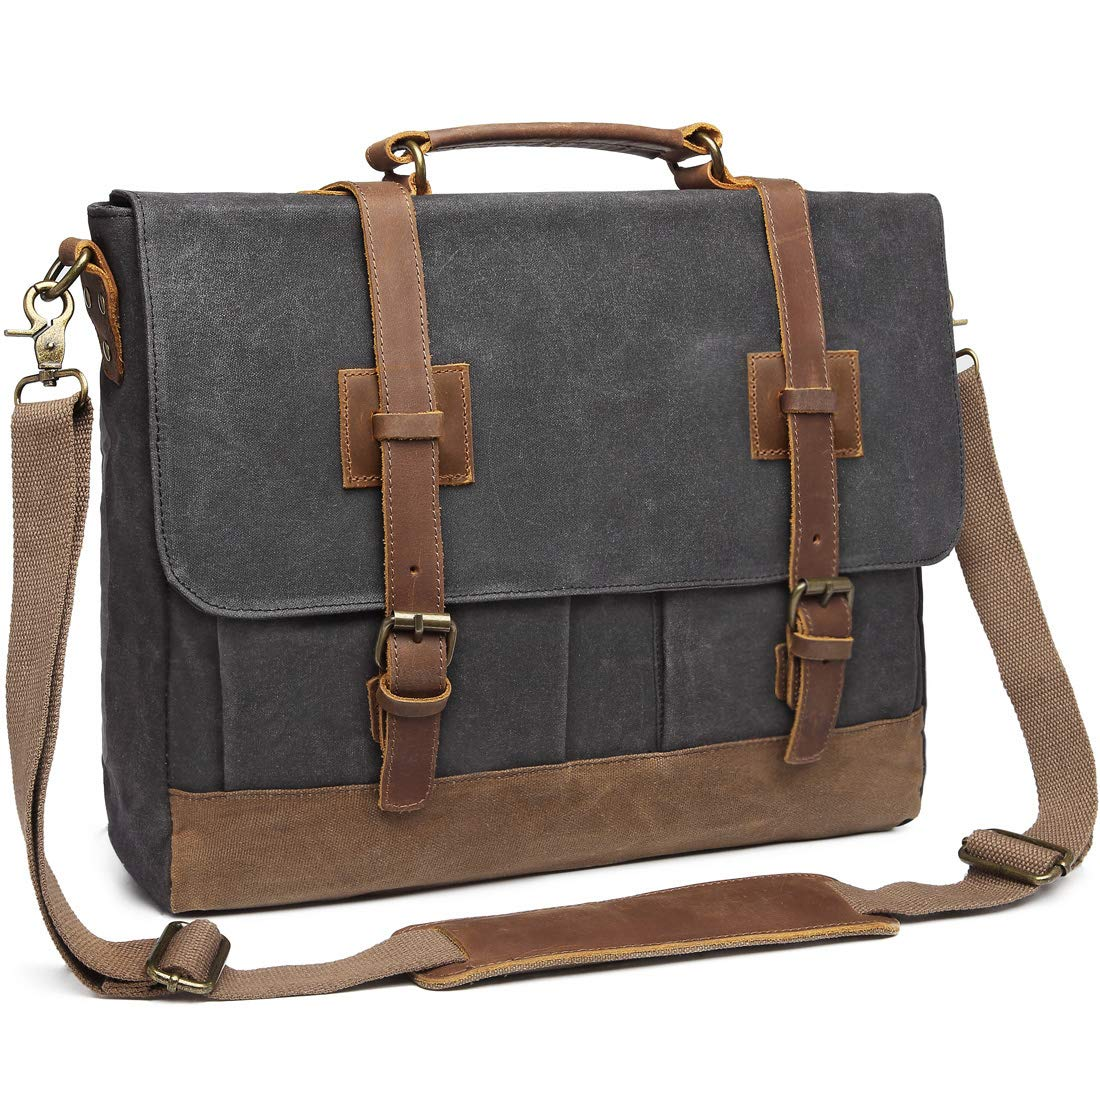 Messenger Bag for Men 15.6 inch Waterproof Waxed Canvas Genuine Leather Briefcase Computer Laptop Bag Large Retro Satchel Shoulder Bag Grey